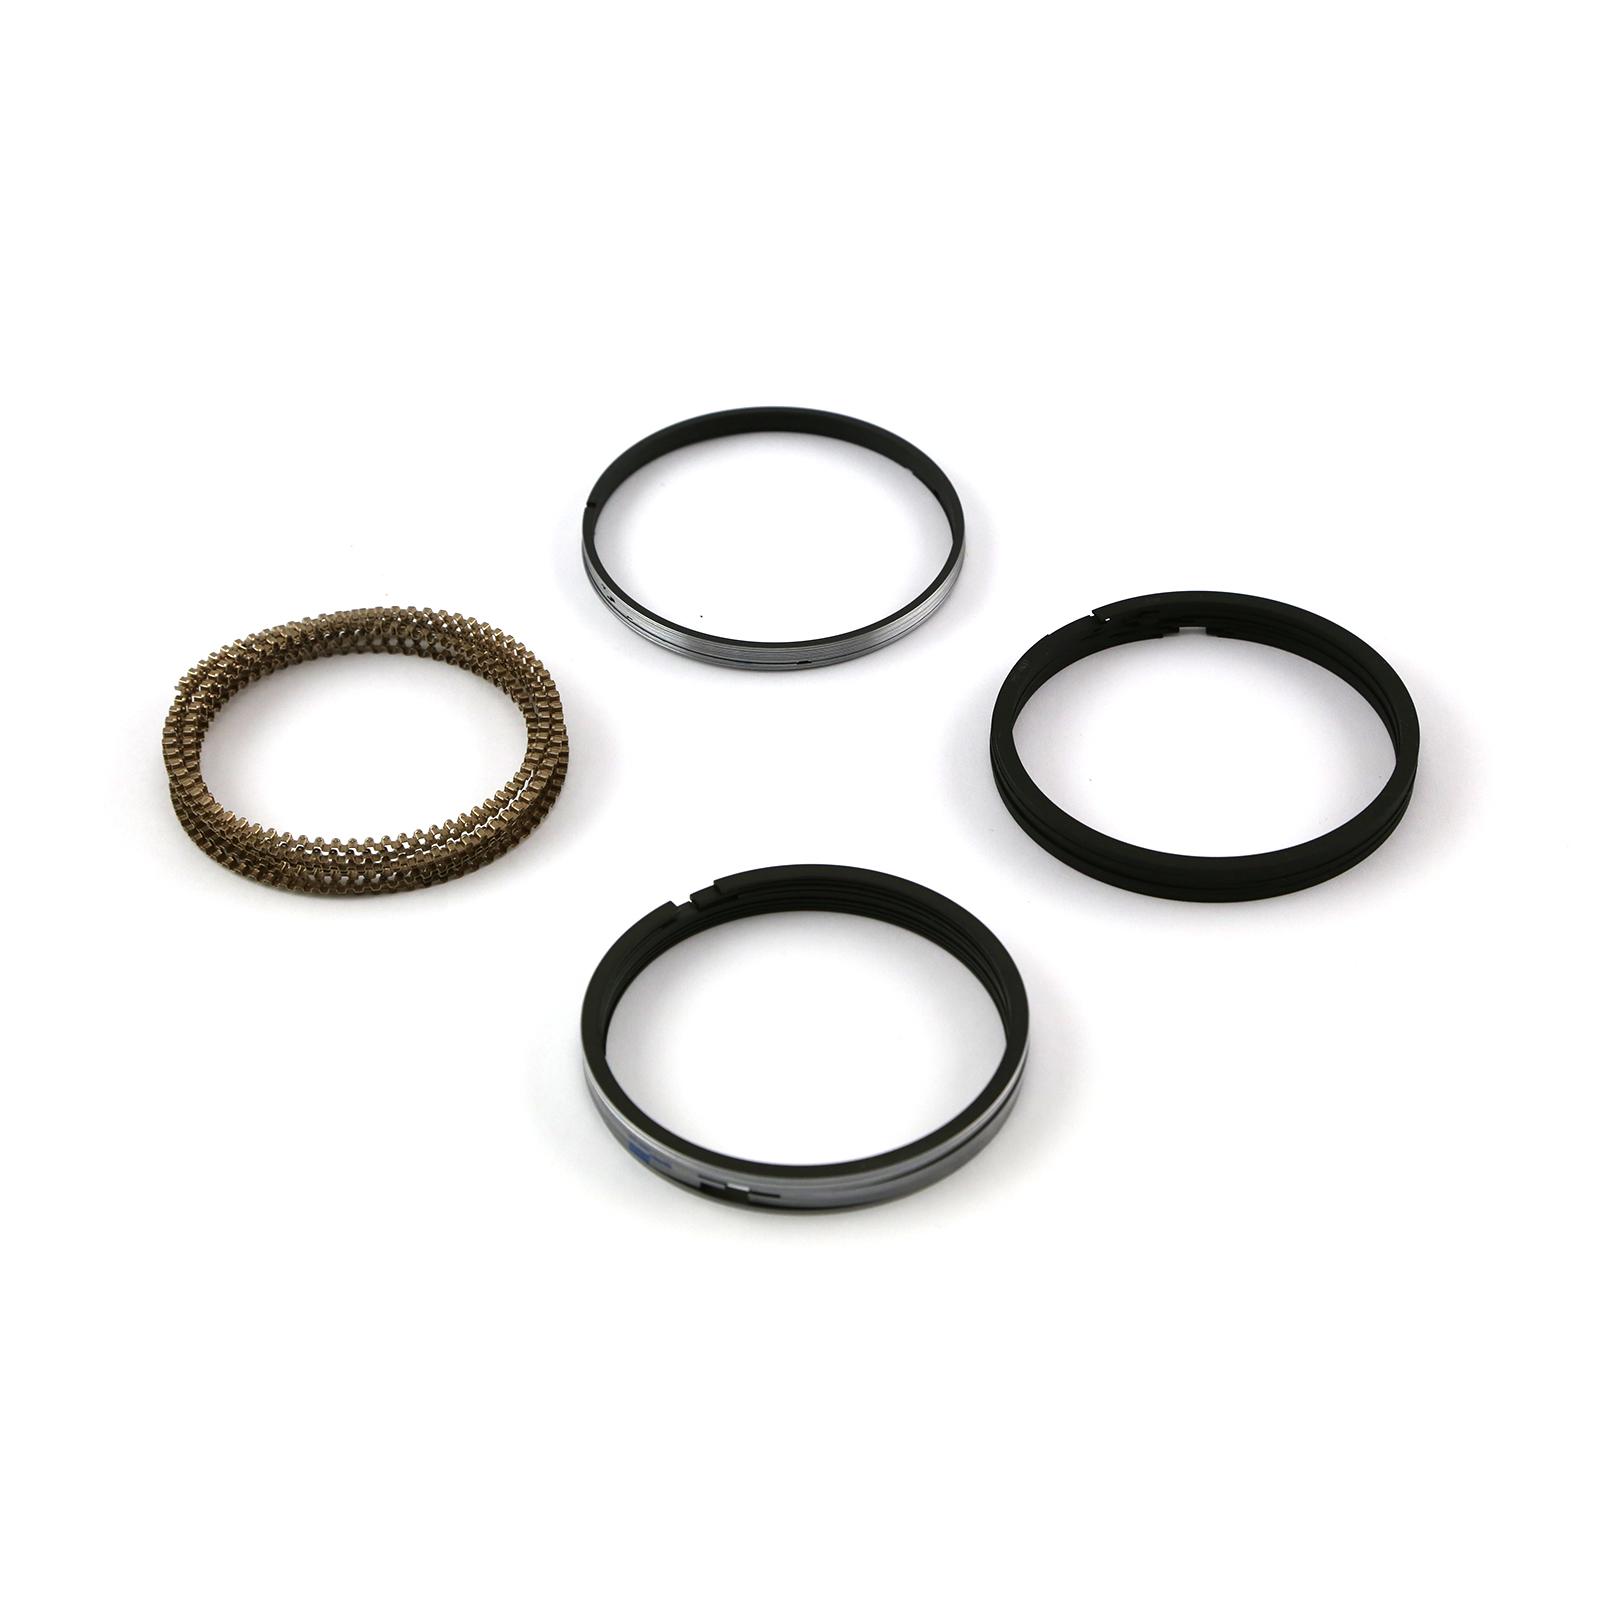 "4.060"" Bore - 1.5 - 1.5 - 3mm Plasma Moly Piston Ring Set"